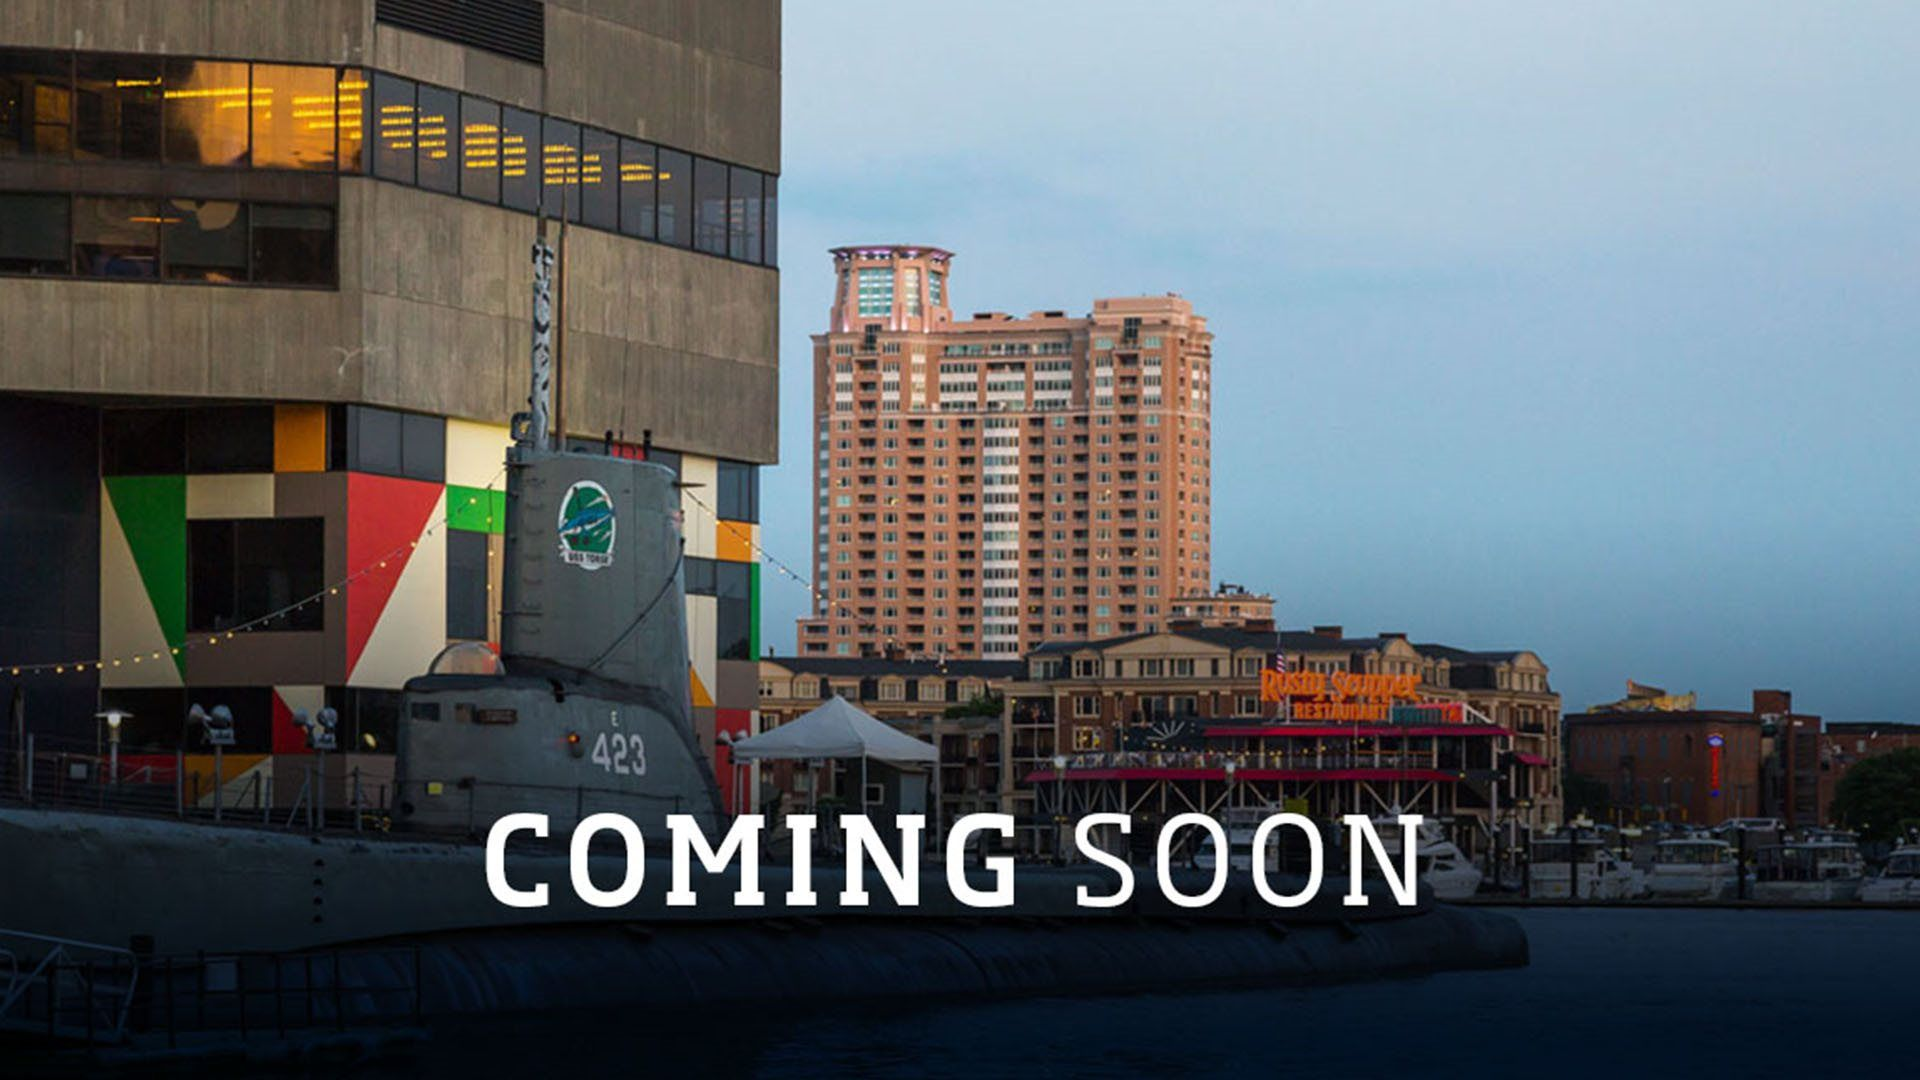 Patapsco Glen Coming  Soon